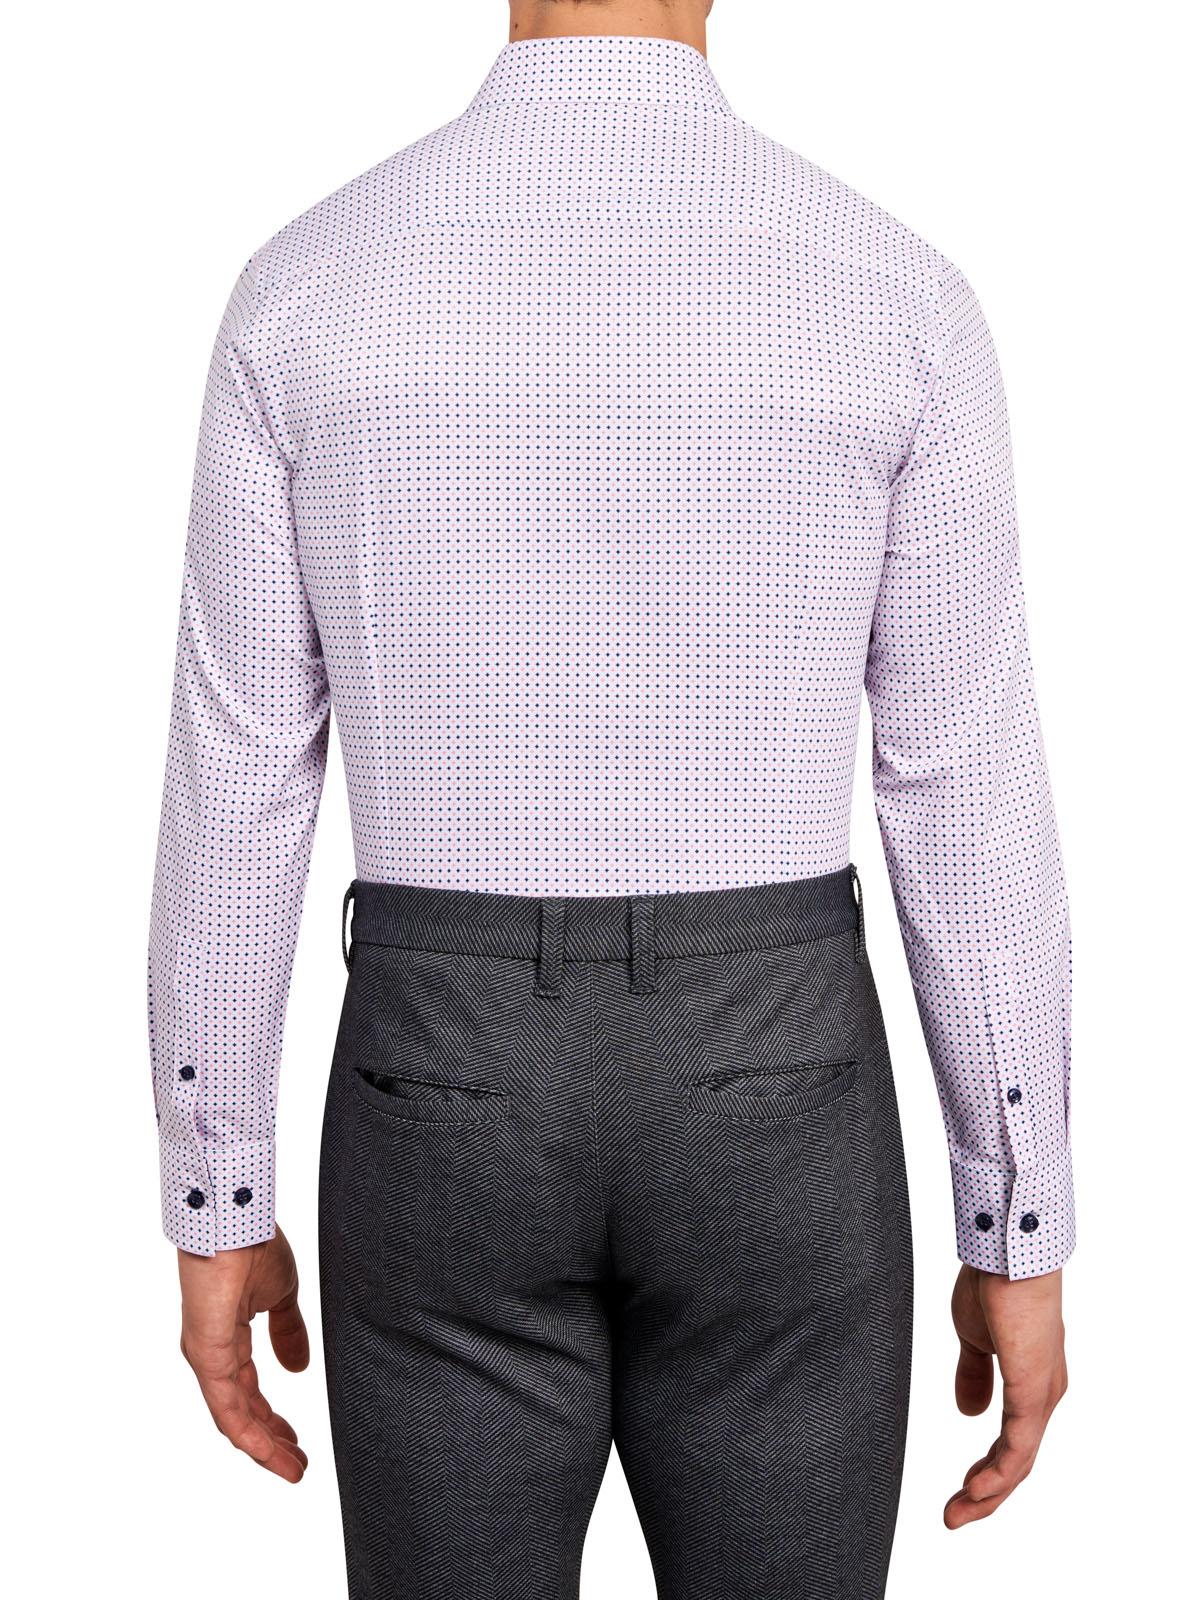 STAR PRINT COOLING PERFORMANCE STRETCH DRESS SHIRT